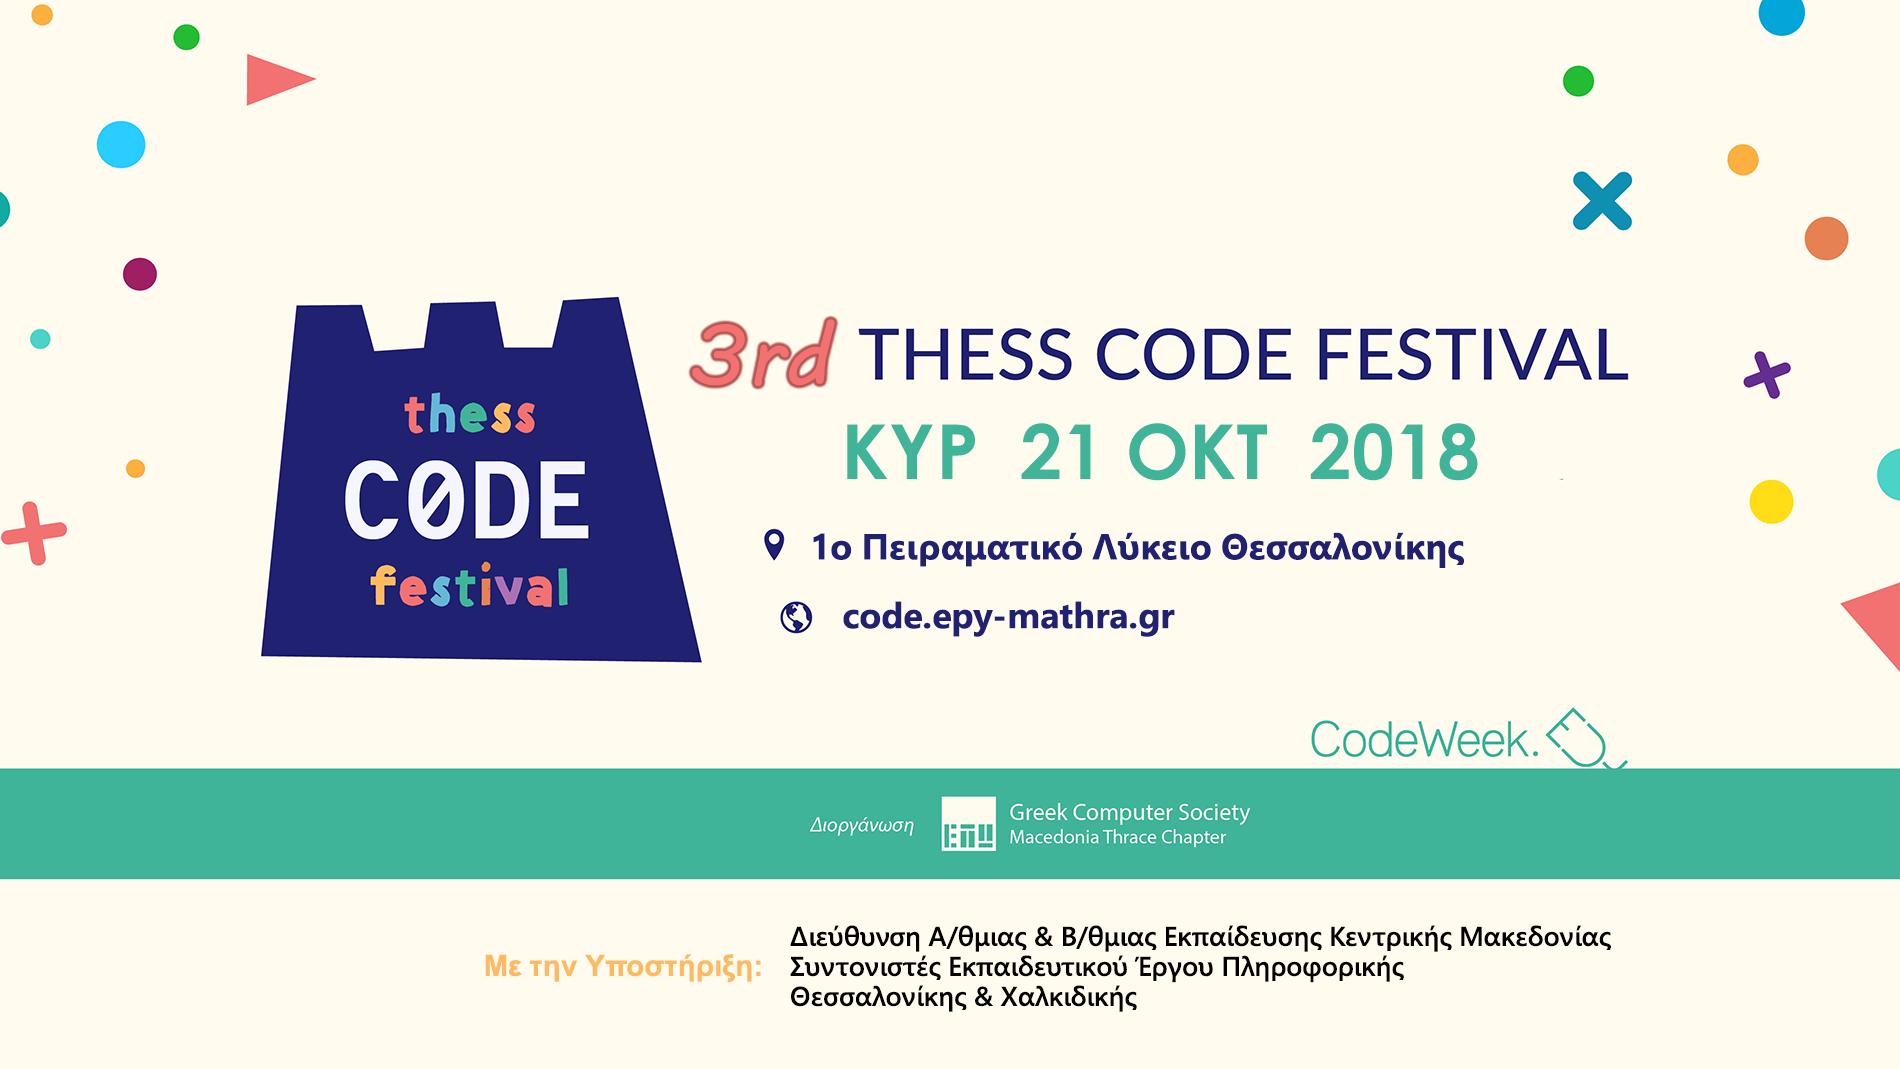 Third Thessaloniki Code Festival